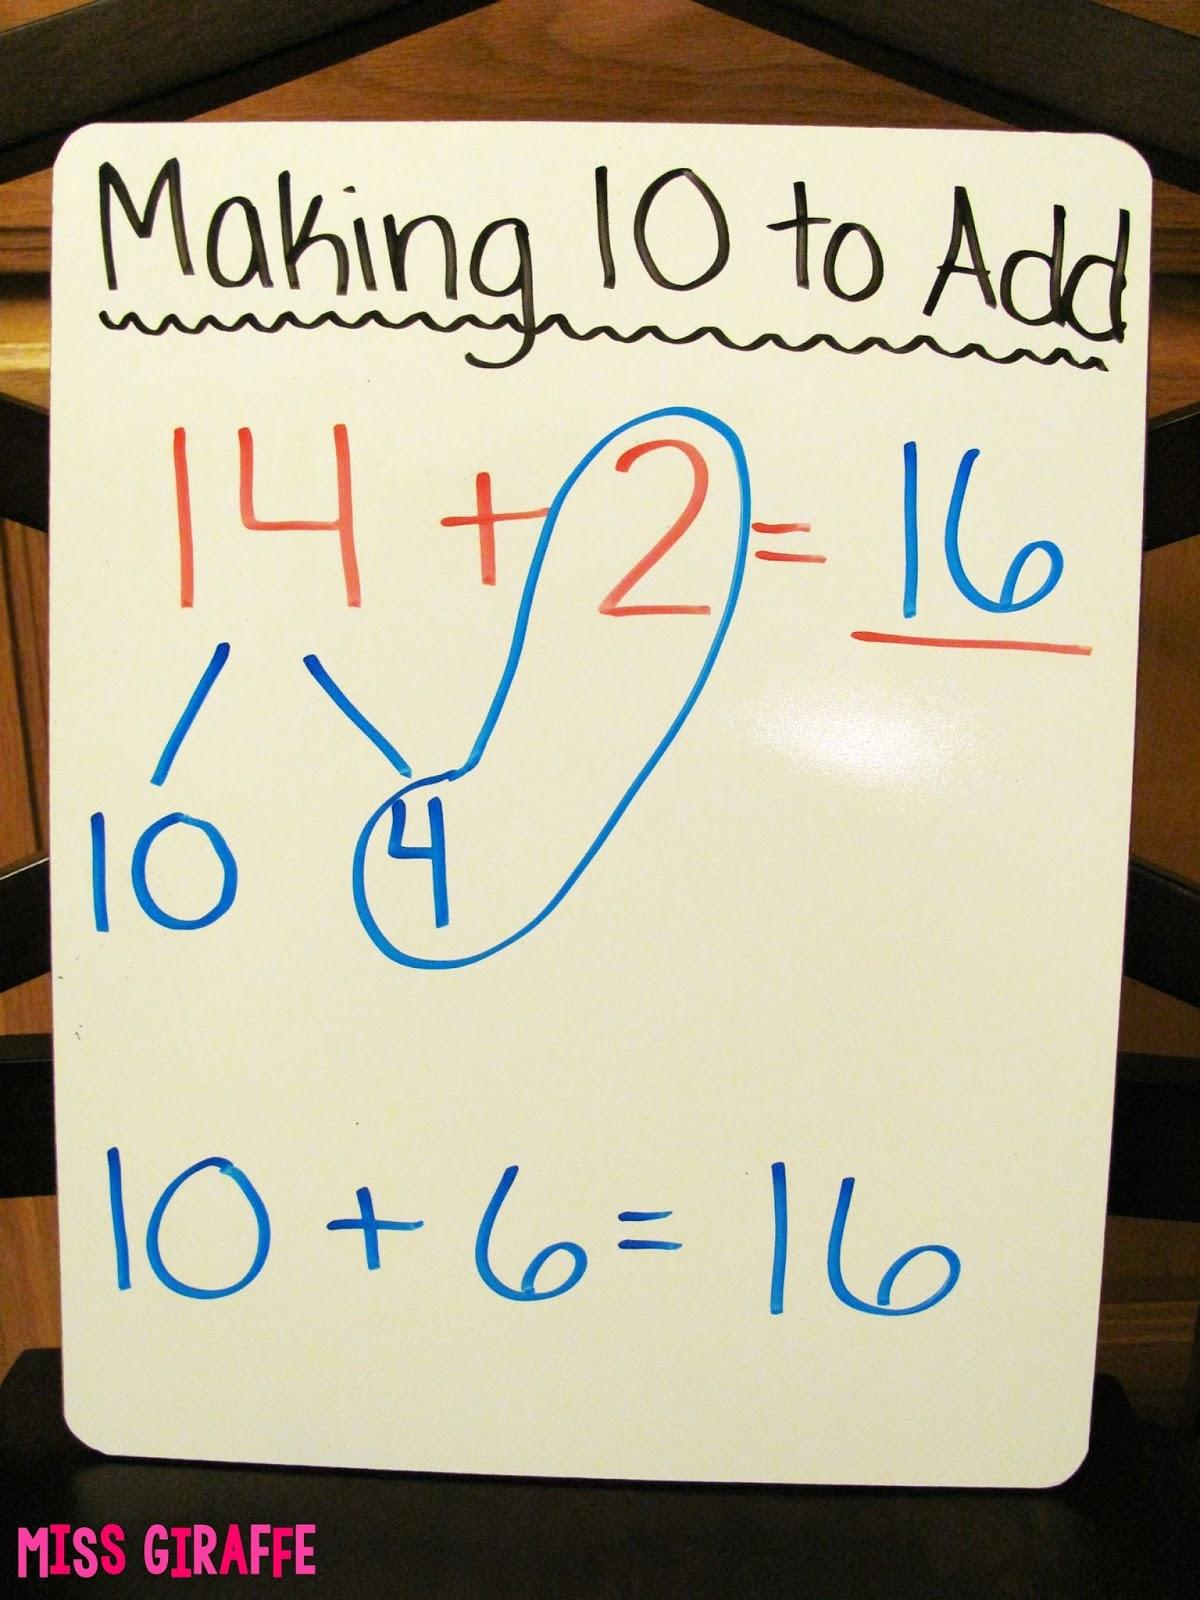 Miss Giraffe\'s Class: Making a 10 to Add